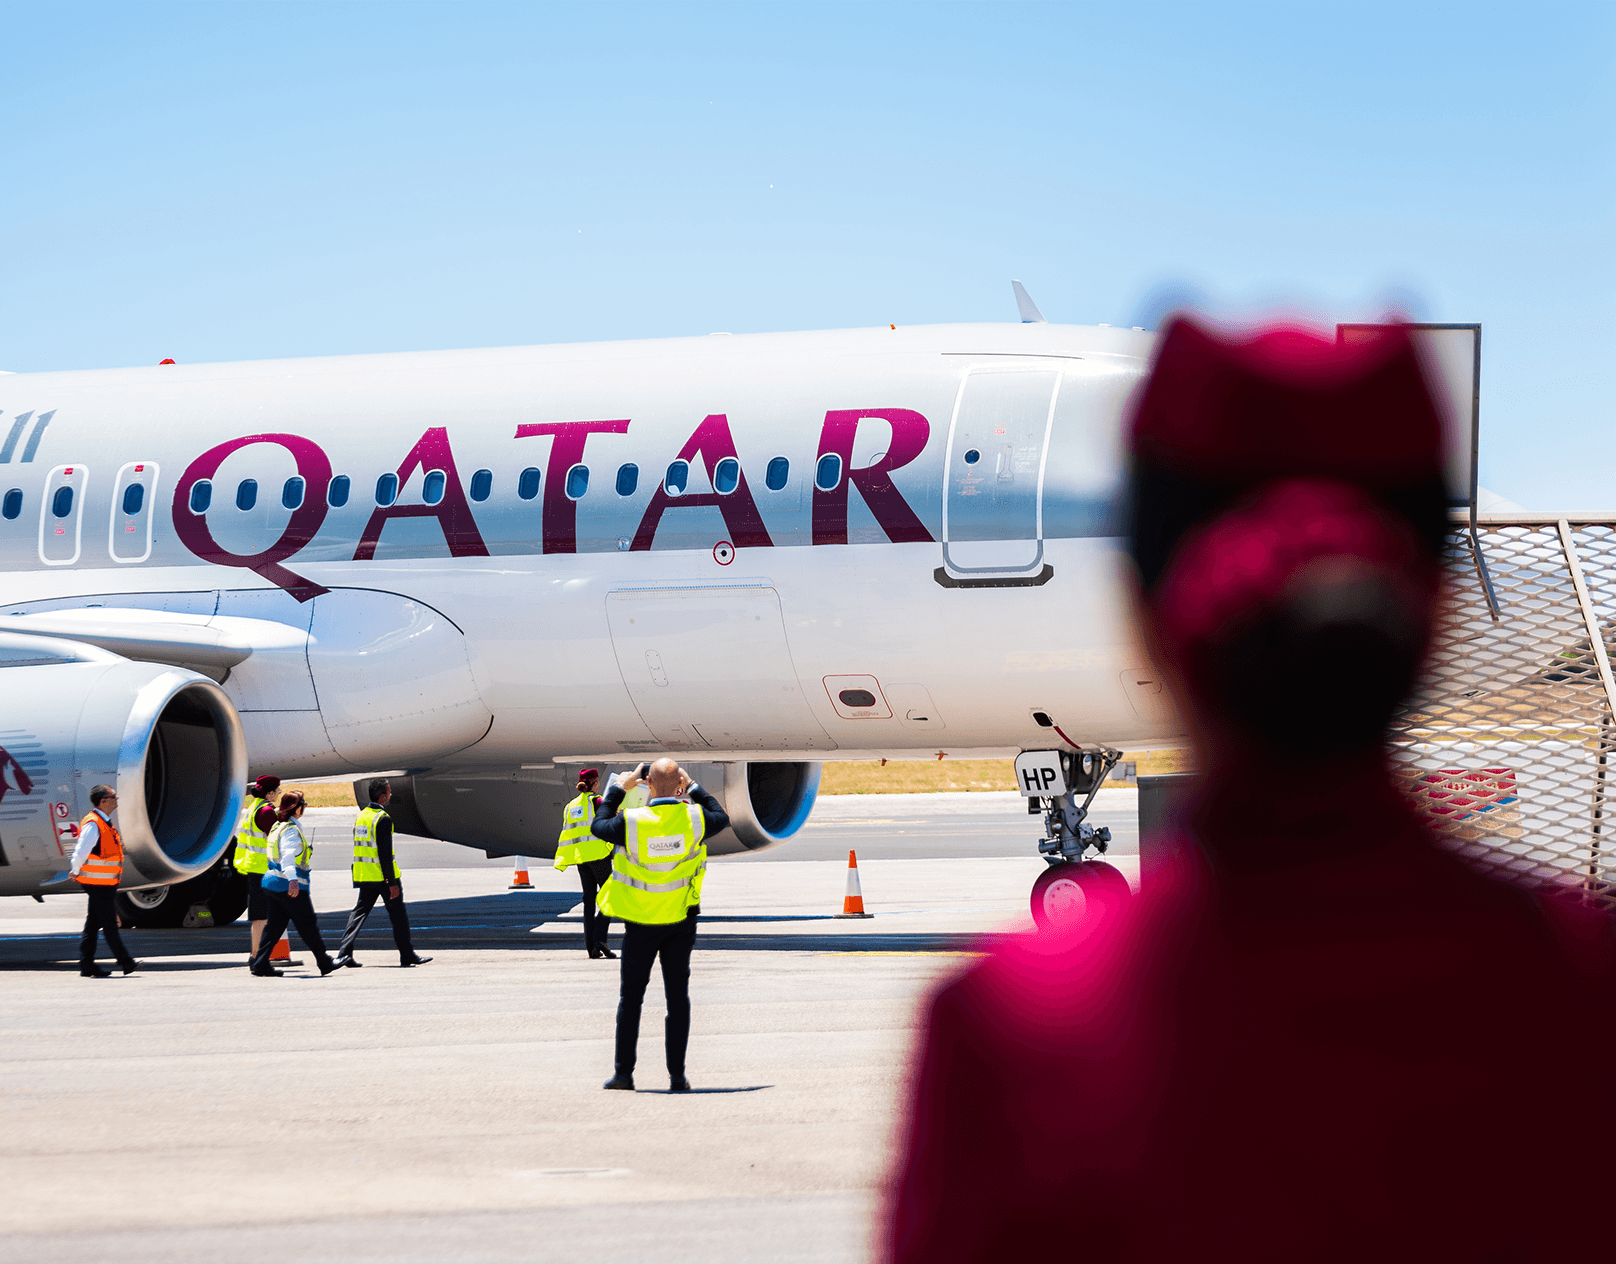 Qatar Airways - Welcoming the World's Best Airline image